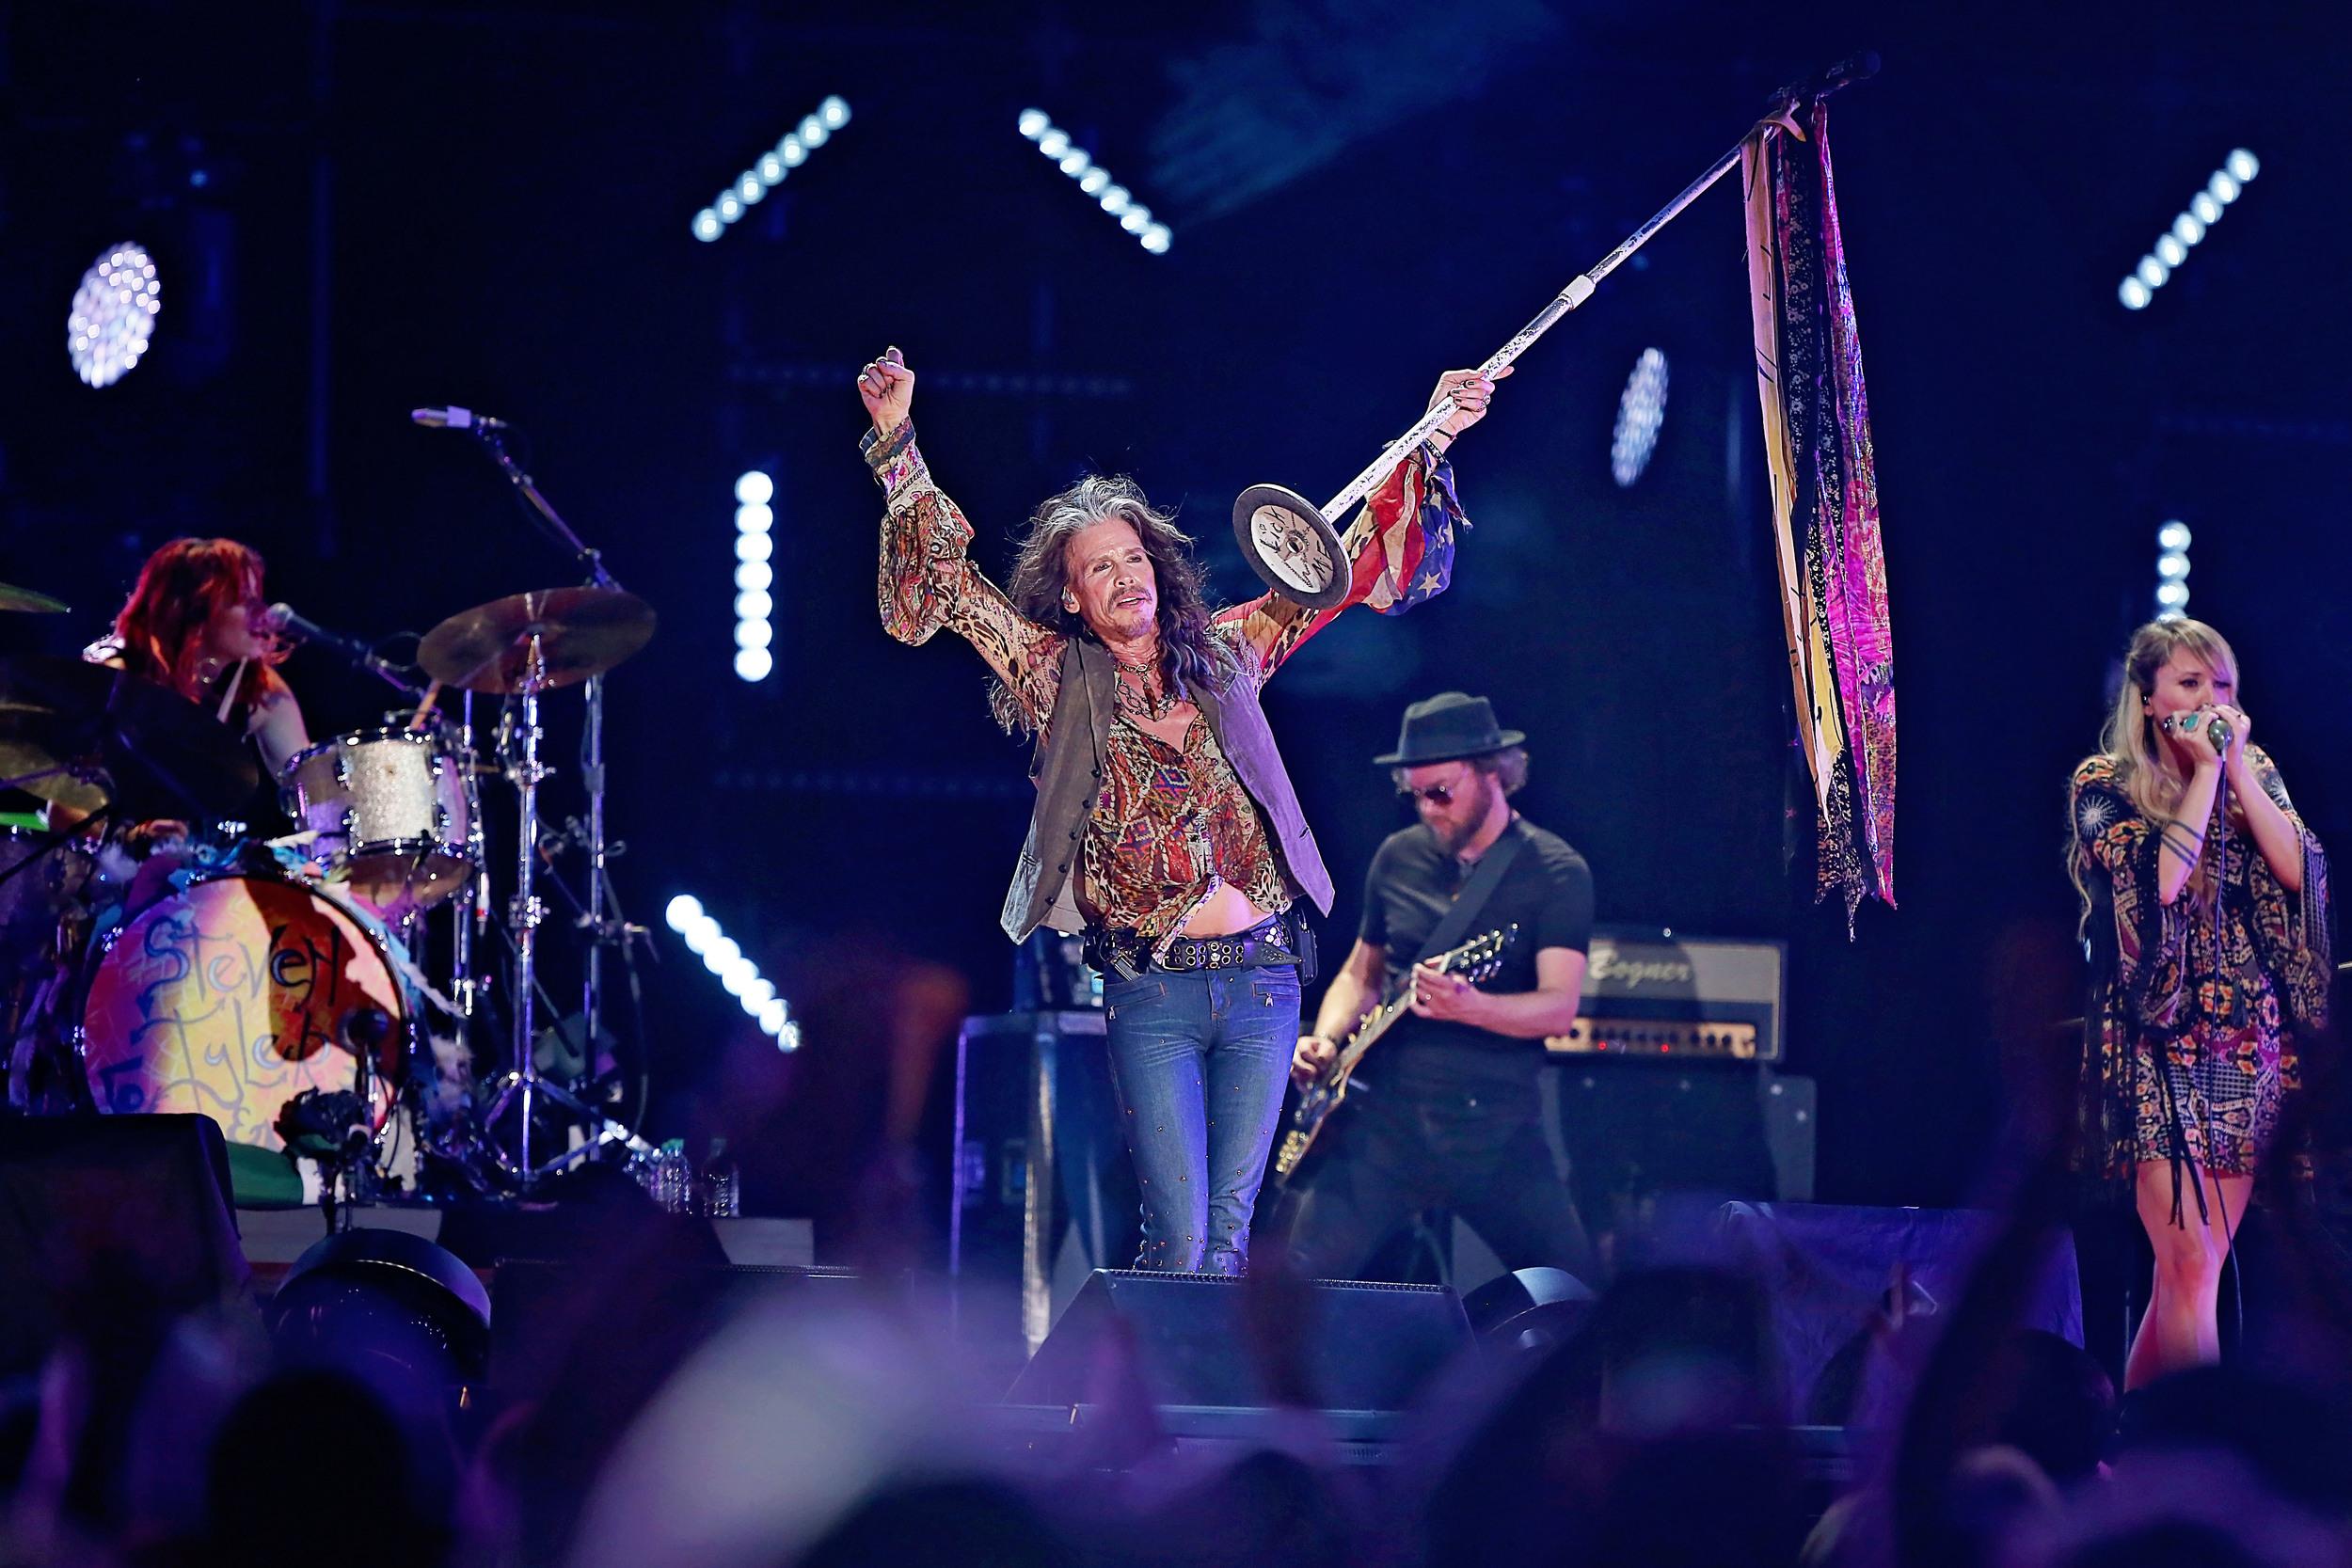 Steven Tyler performs at Nissan Stadium during CMA Fest